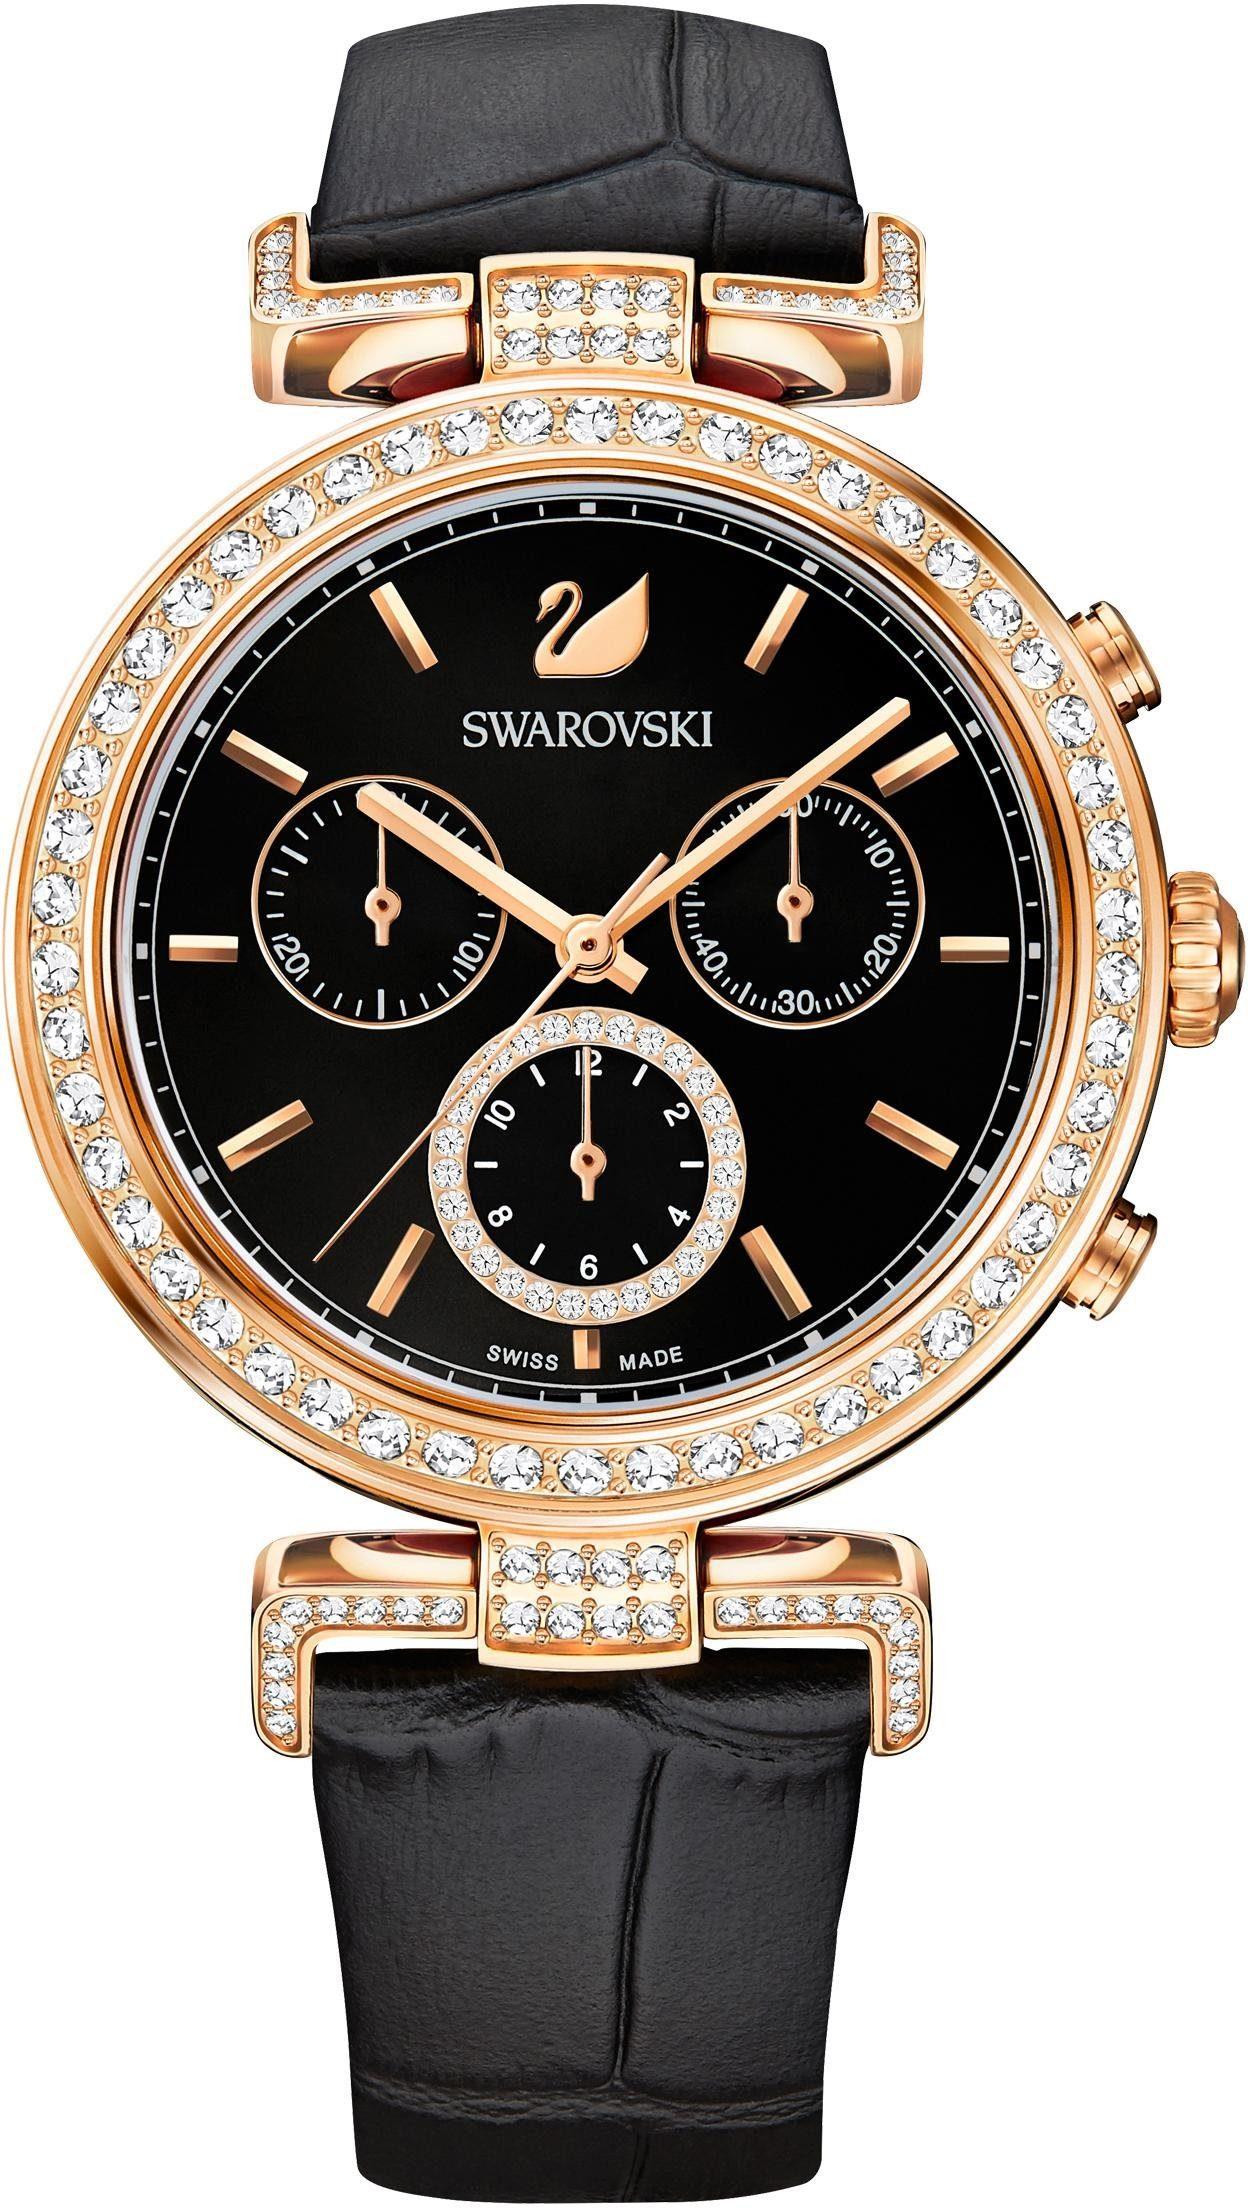 Swarovski Chronograph »Era Journey Uhr, Lederarmband, schwarz, roséfarben, 5295320«